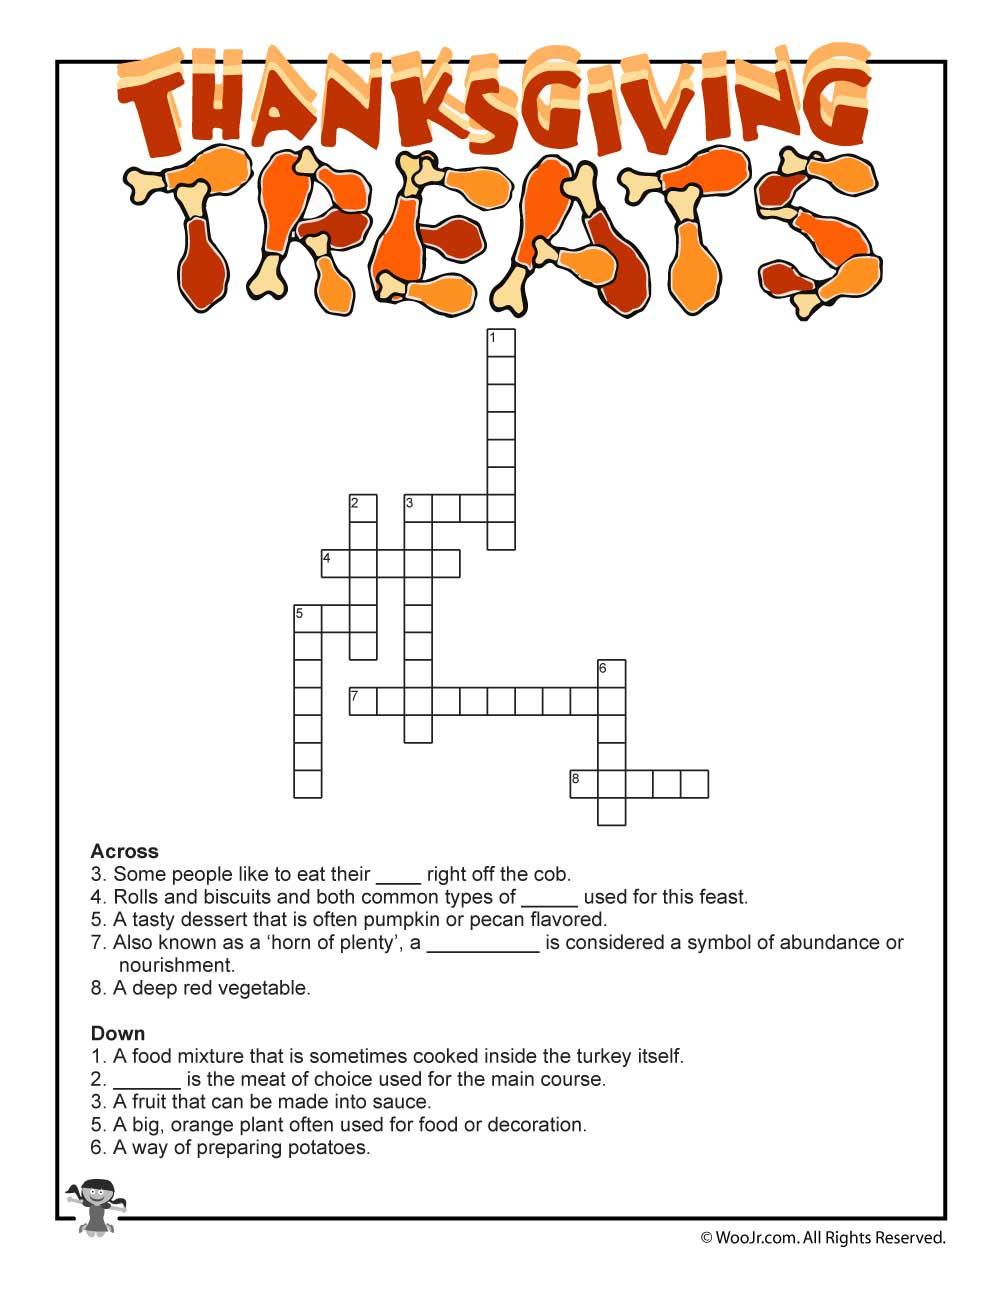 Thanksgiving Crossword Puzzle | Woo! Jr. Kids Activities - Printable Thanksgiving Crossword Puzzles